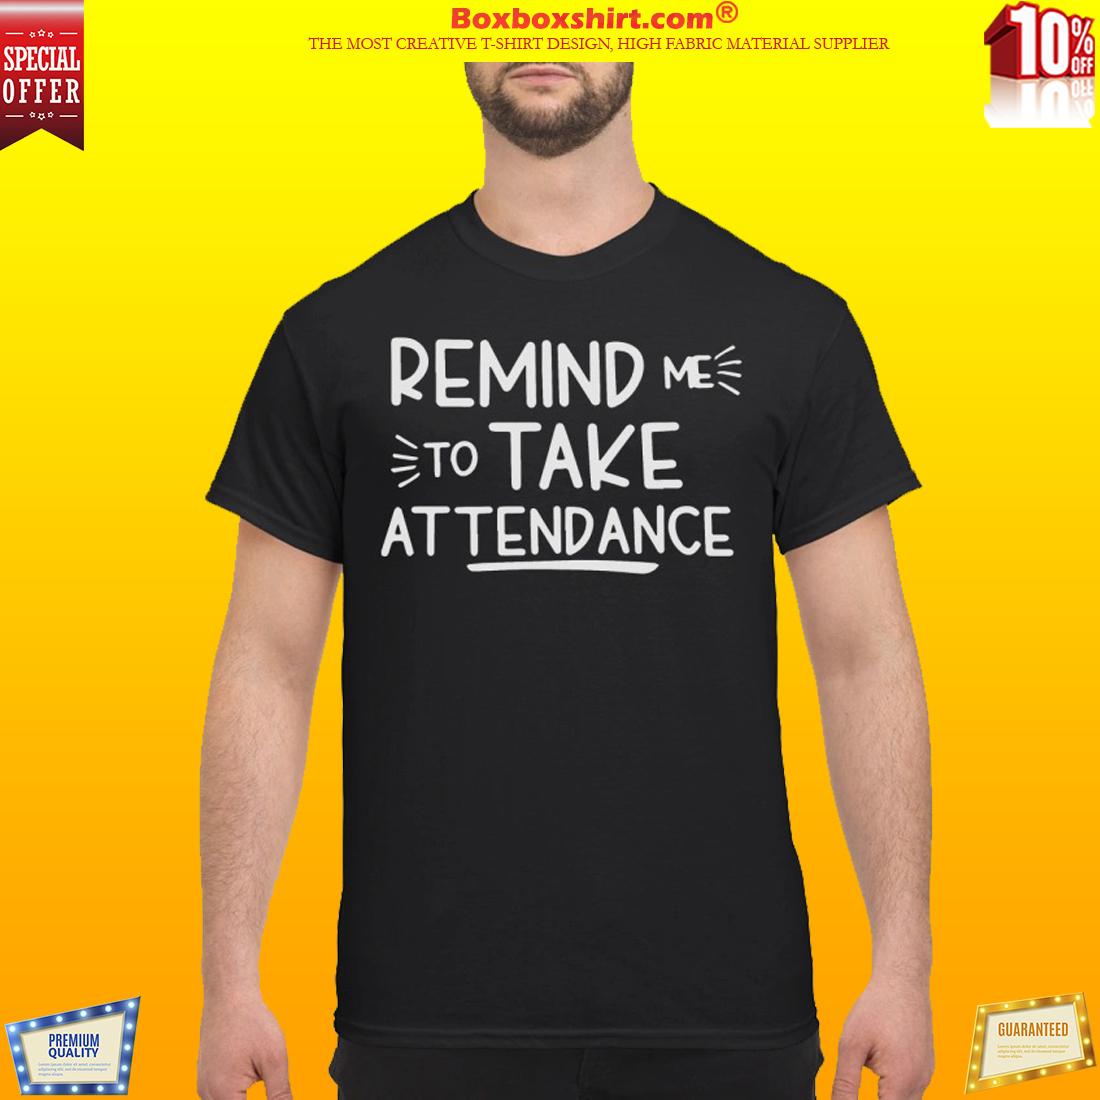 Remind me to take attendance shirt and sweatshirt